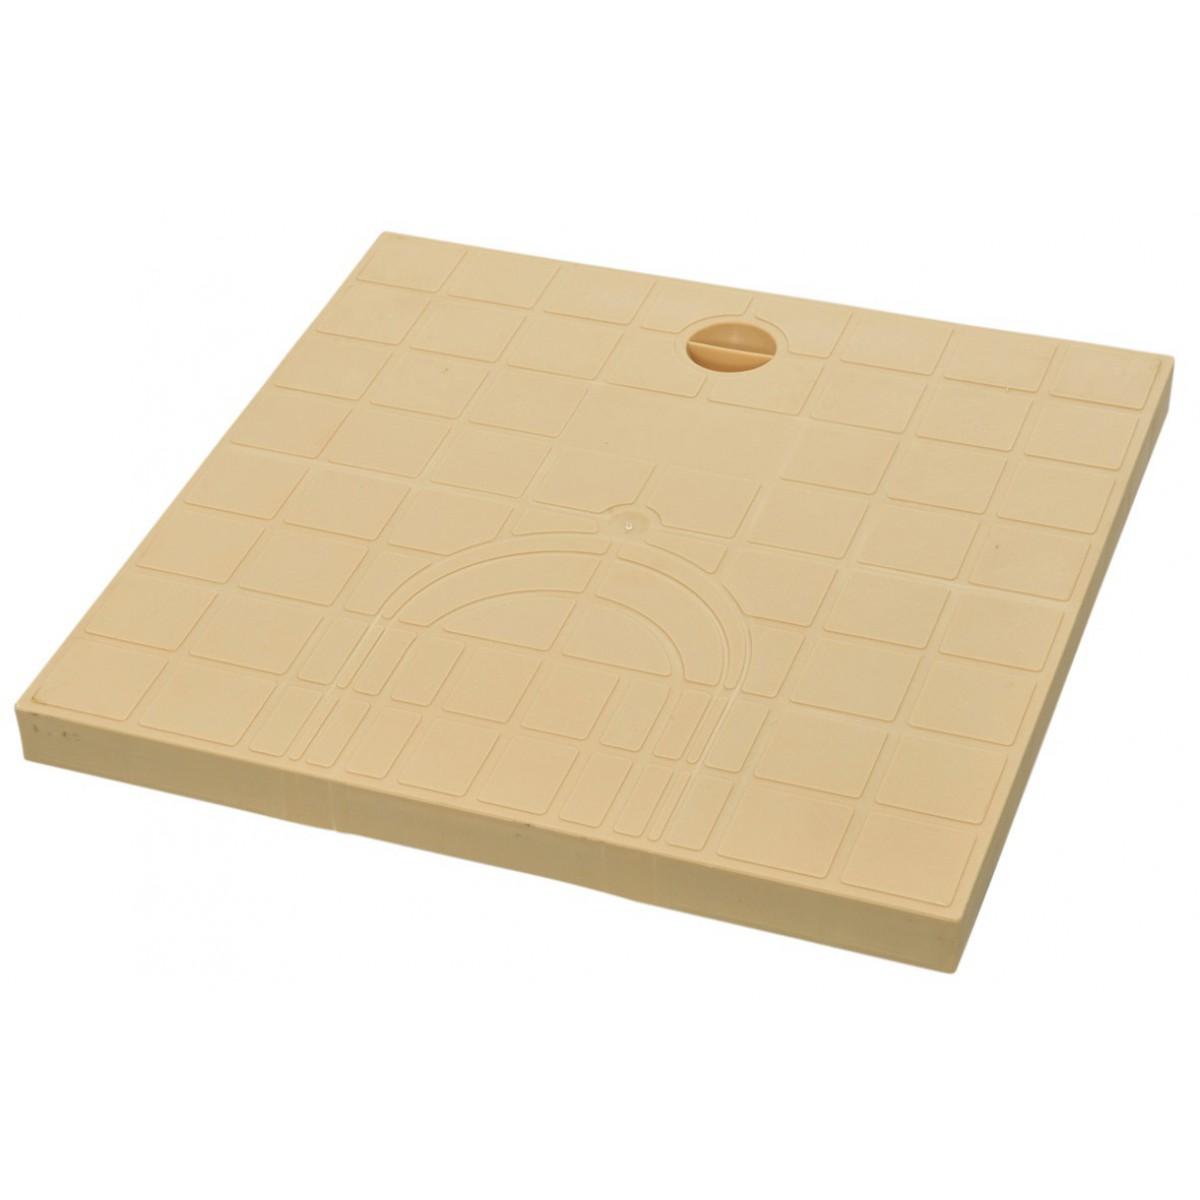 Tampon de regard prédécoupé Girpi - Sable - Dimension 30 x 30 cm